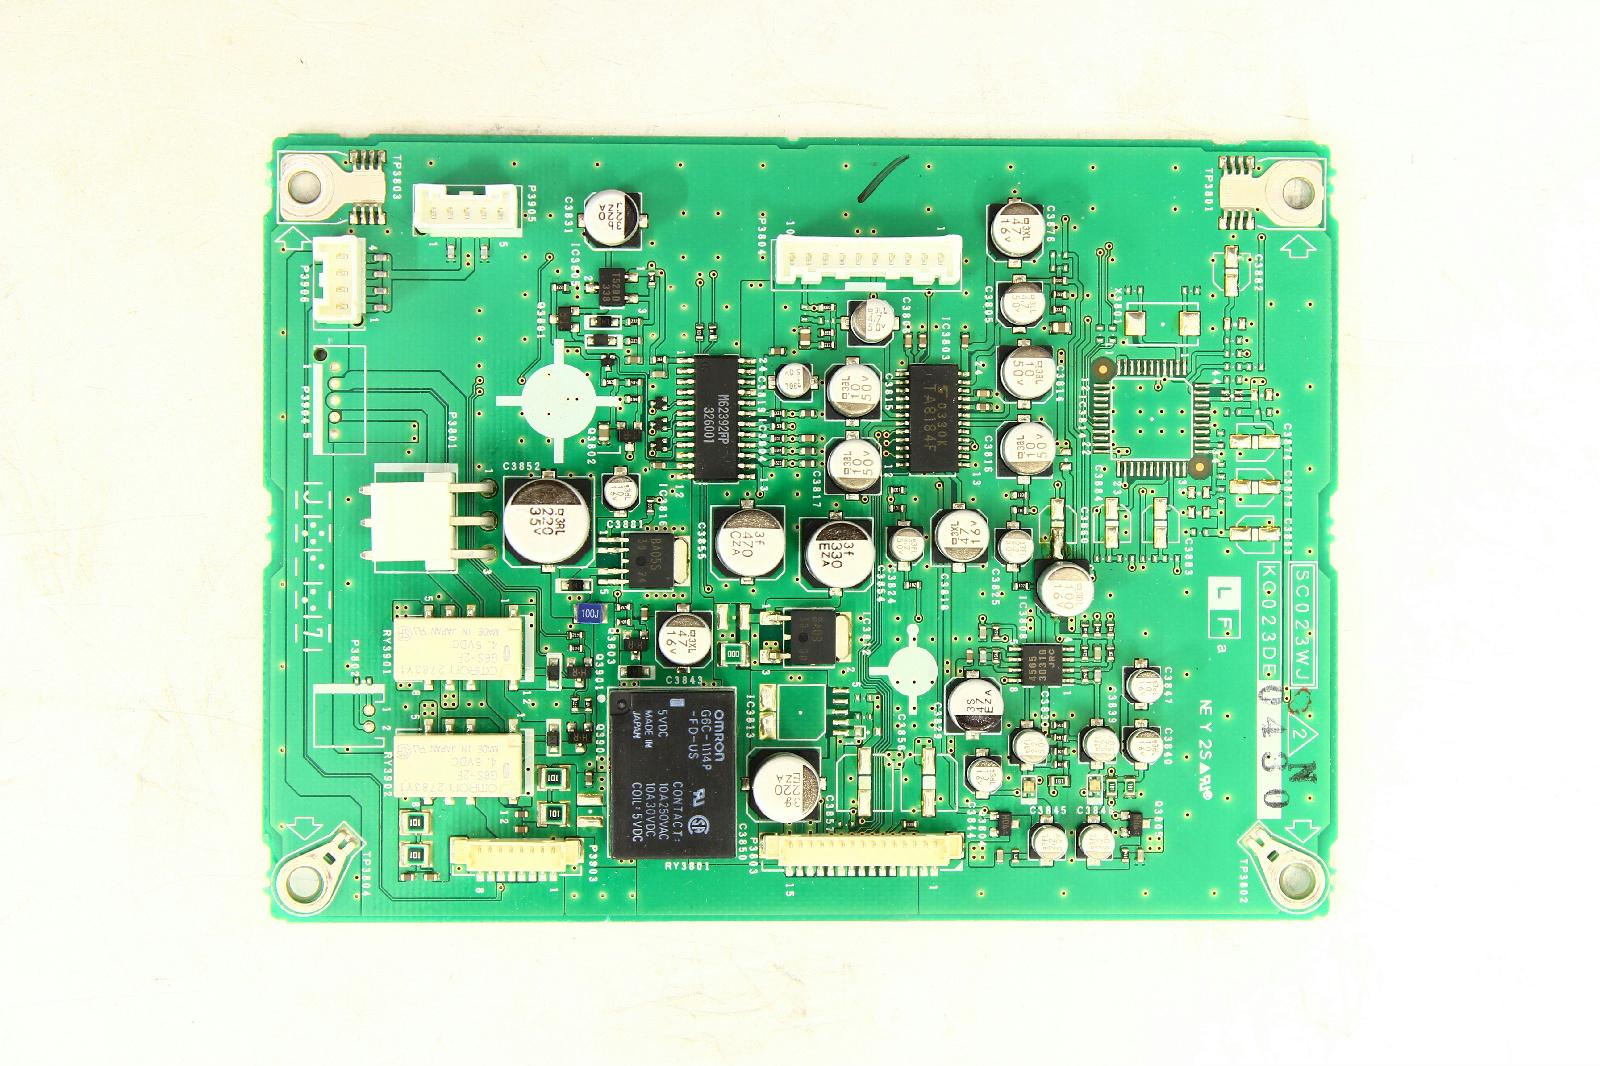 Sharp Lc 37hv6u Circuit Board Duntkc023de04 Tvparts At How Do You Make A